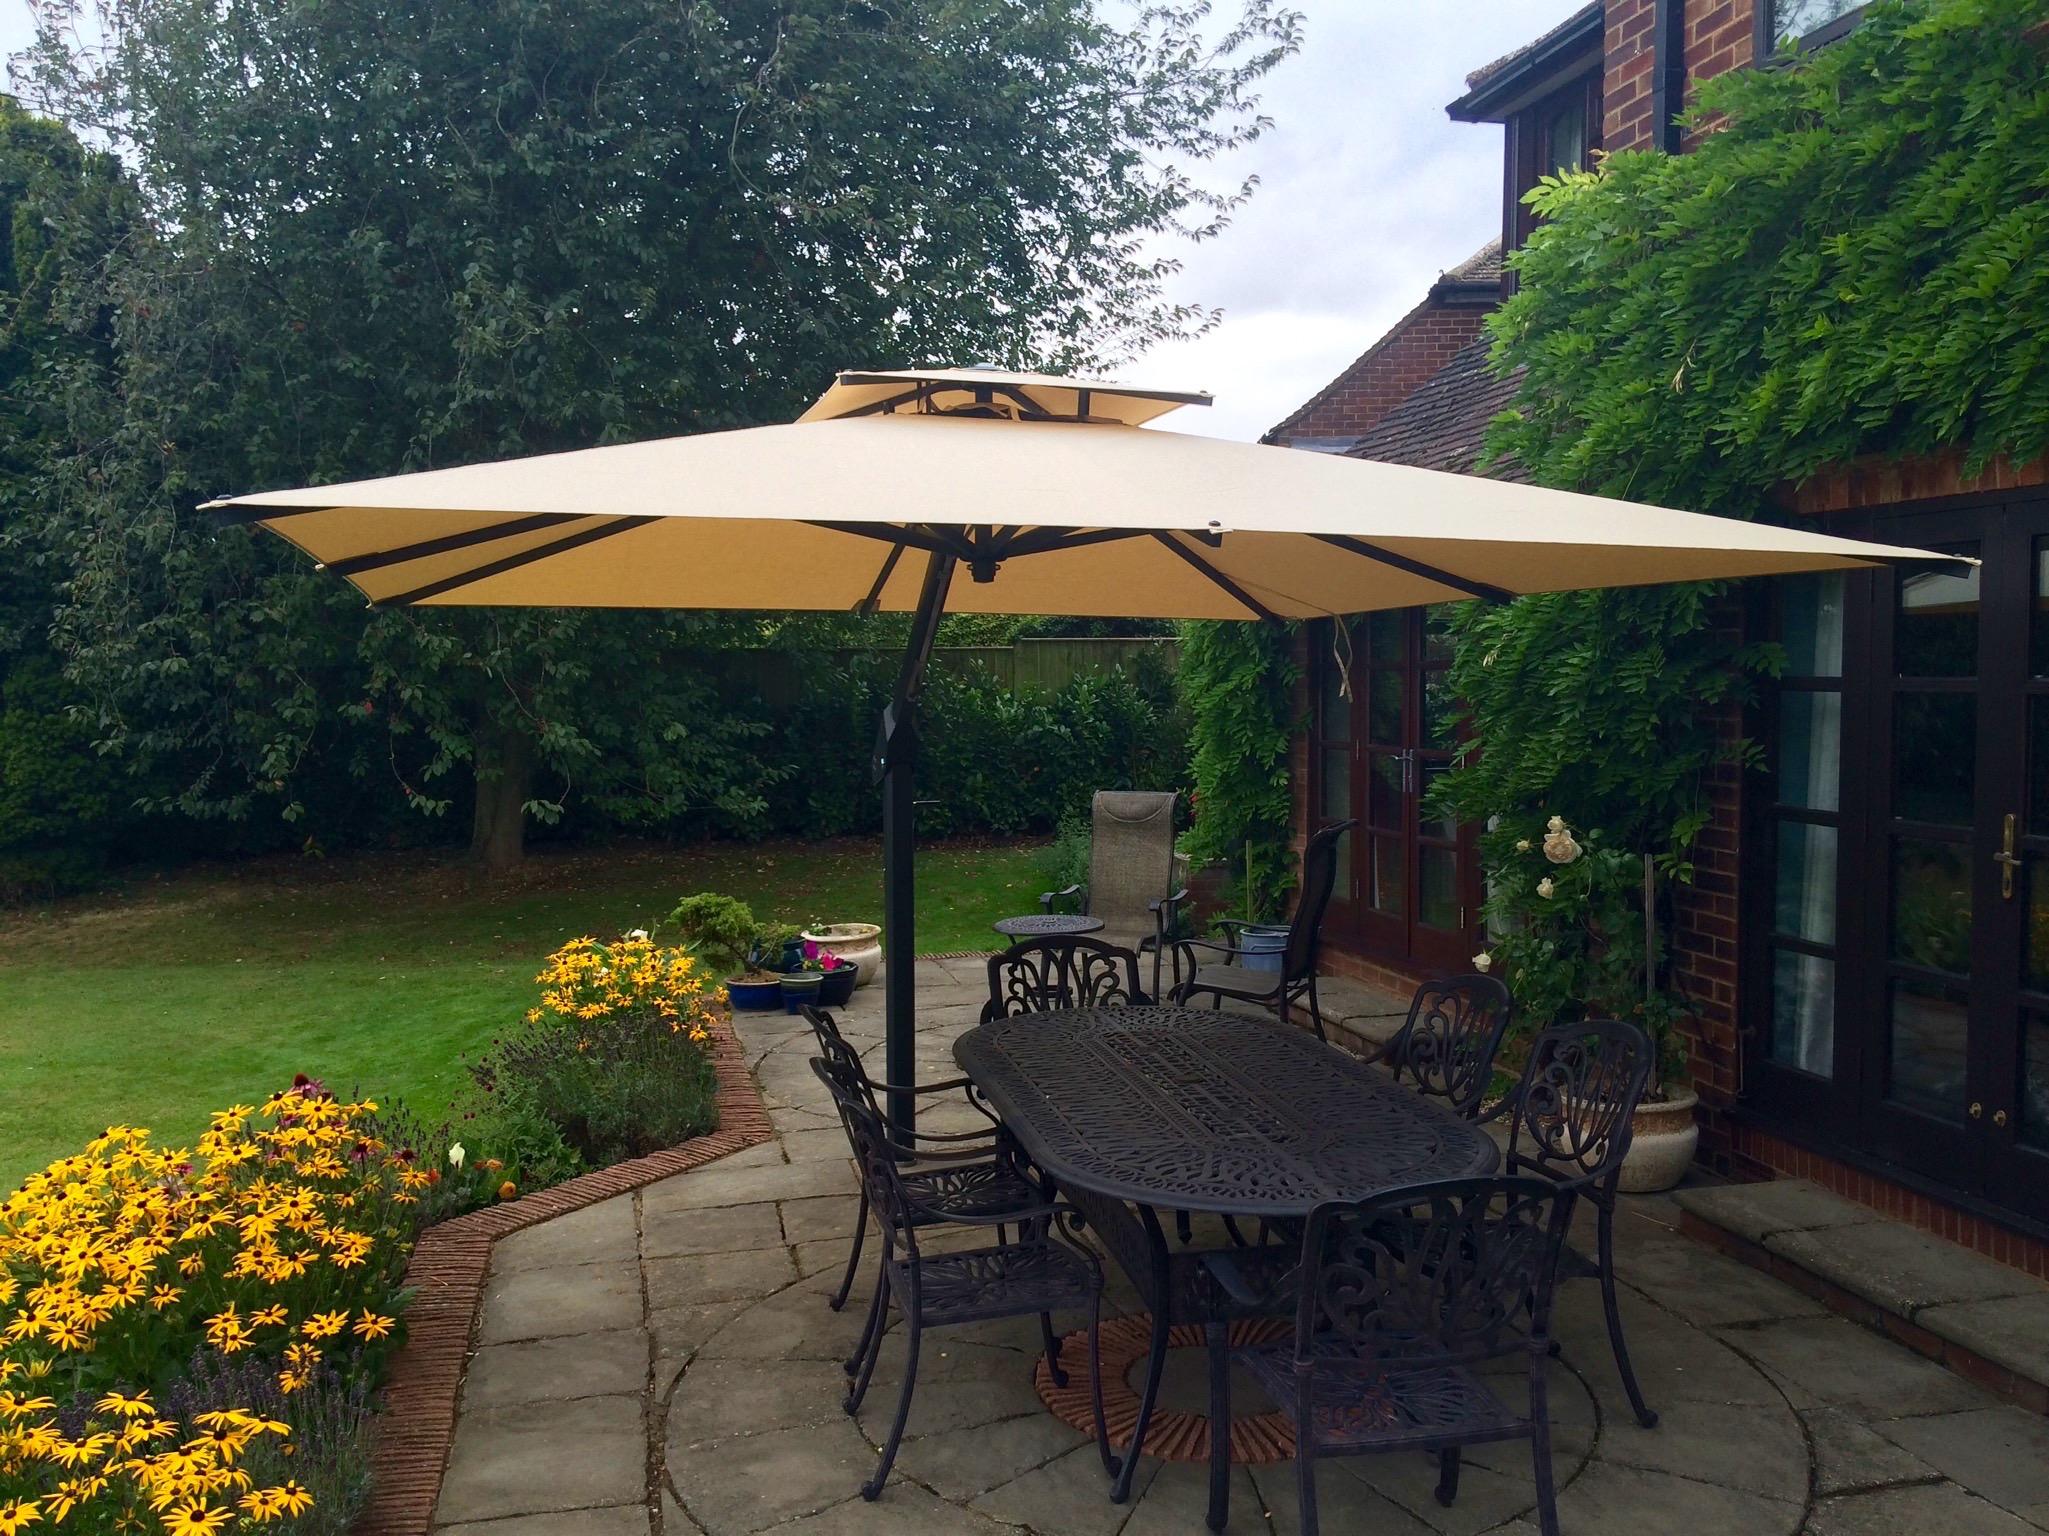 3.5m garden parasol